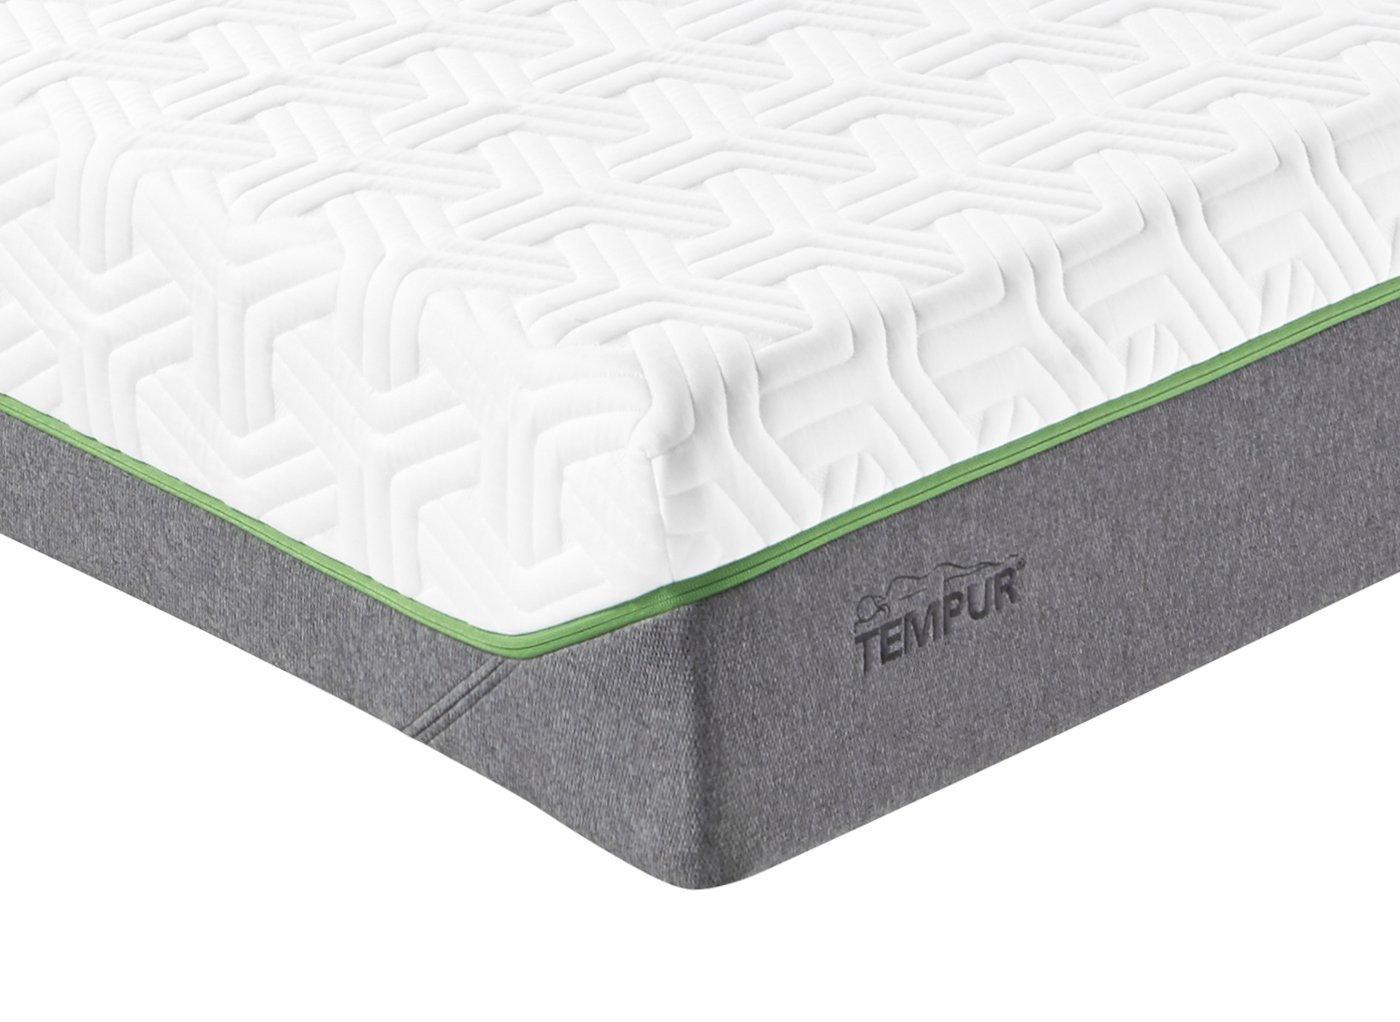 Tempur Cooltouch Hybrid Elite Adjustable Mattress - Medium 2'6 Small single